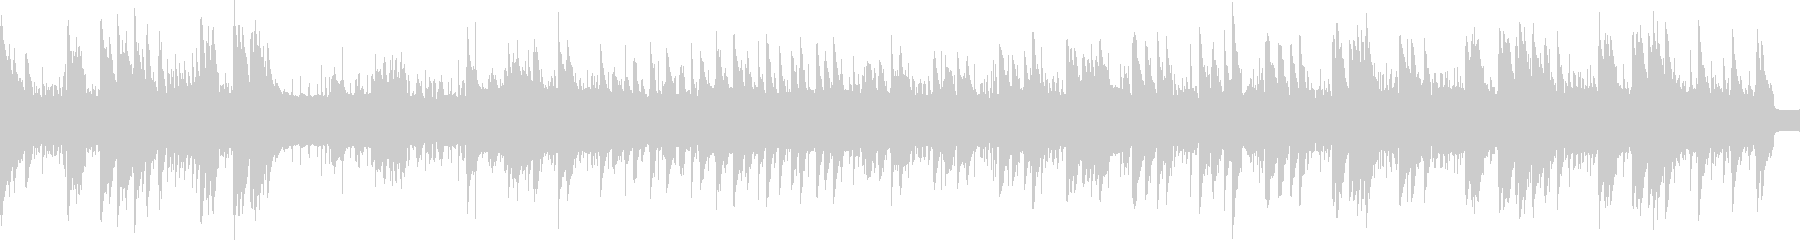 8bitスペースファンタジー 1コーラスの未再生の波形